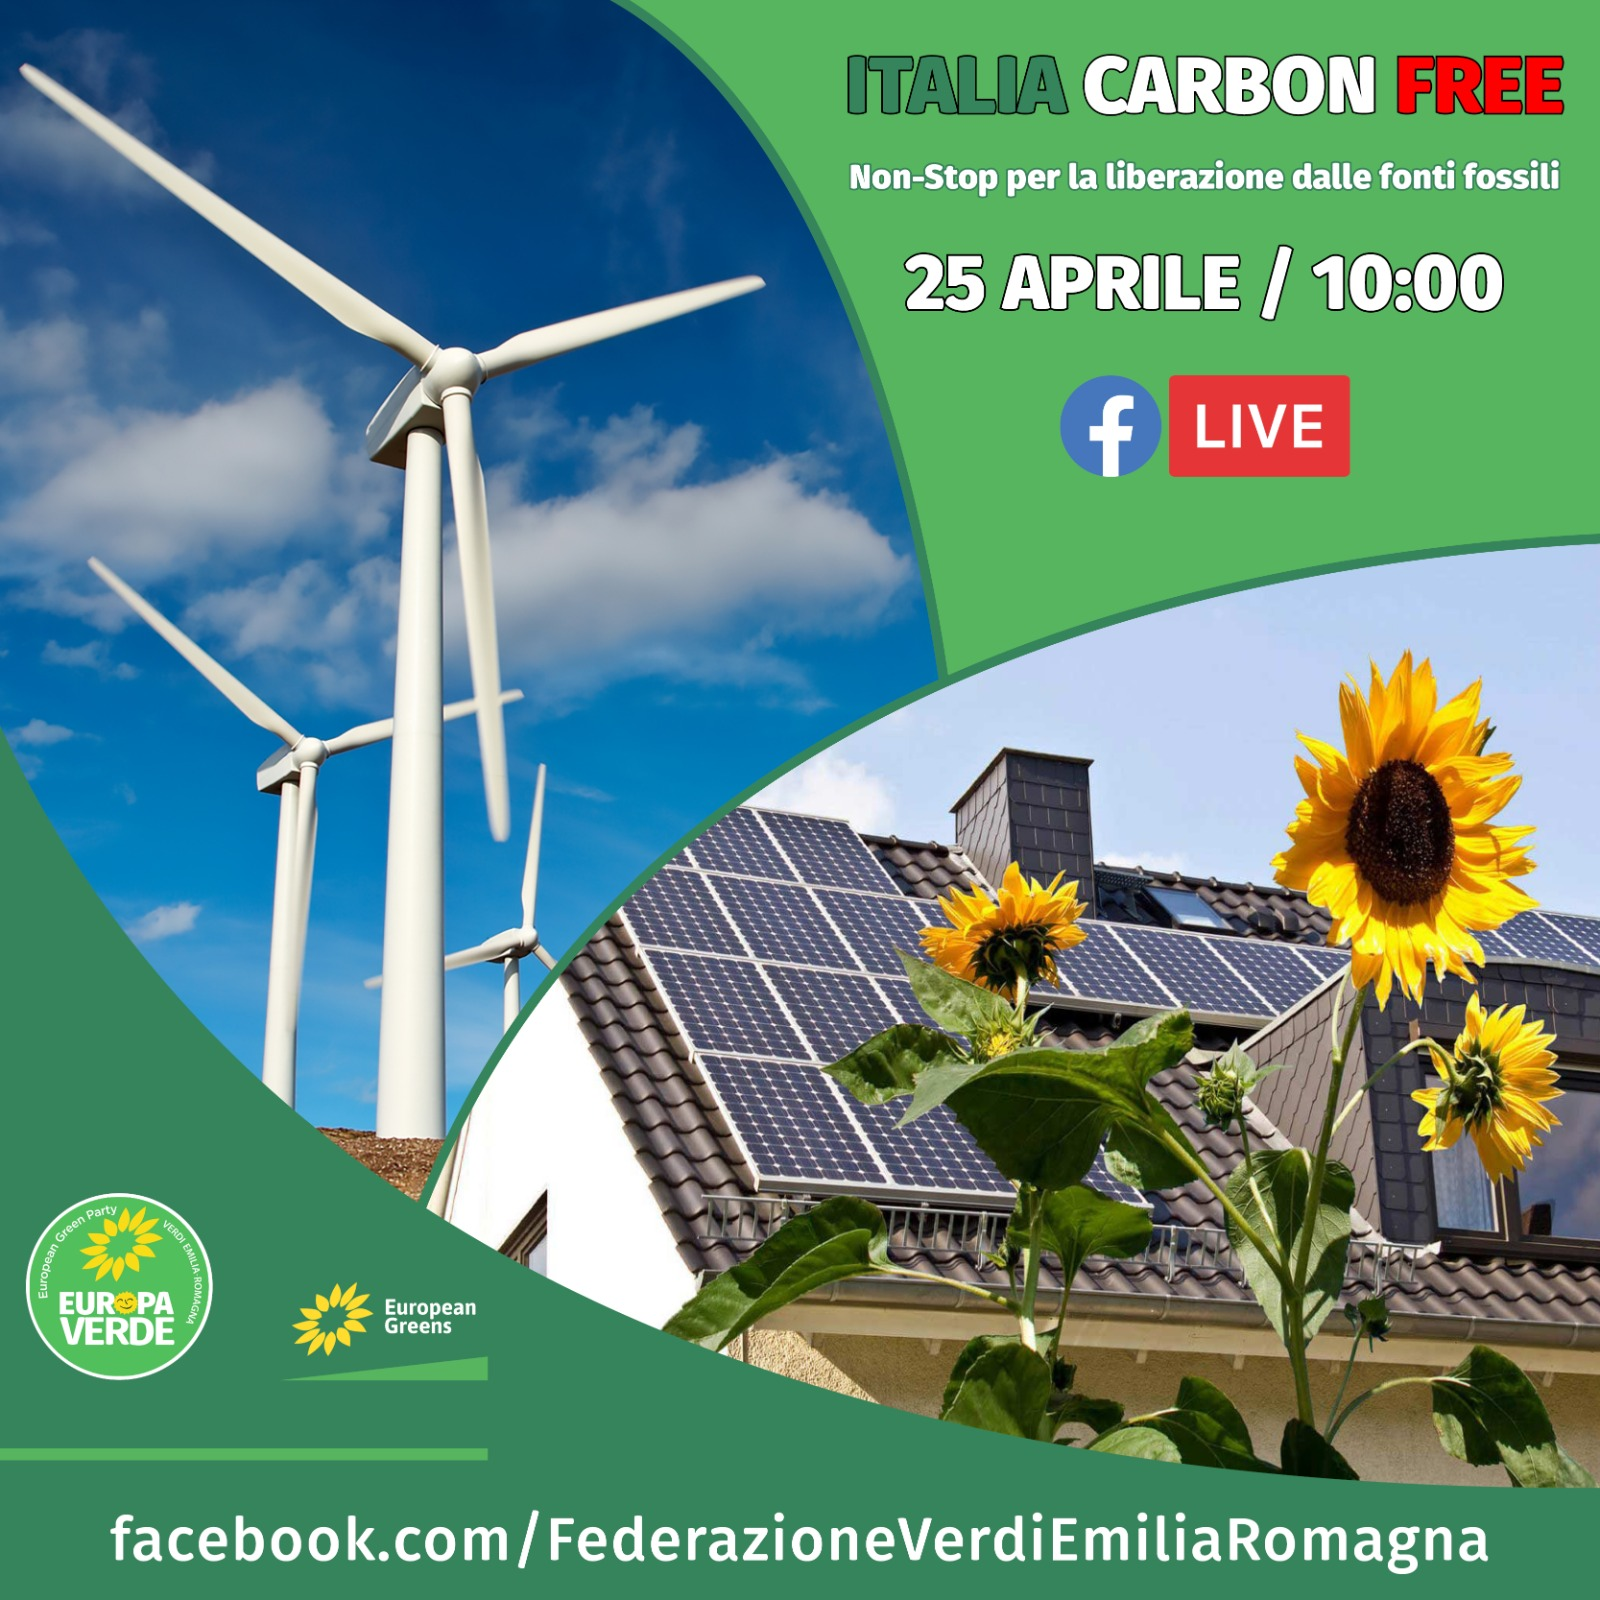 25 APRILE 2021. ITALIA CARBON FREE, LIBERIAMOCI DALLE FONTI FOSSILI